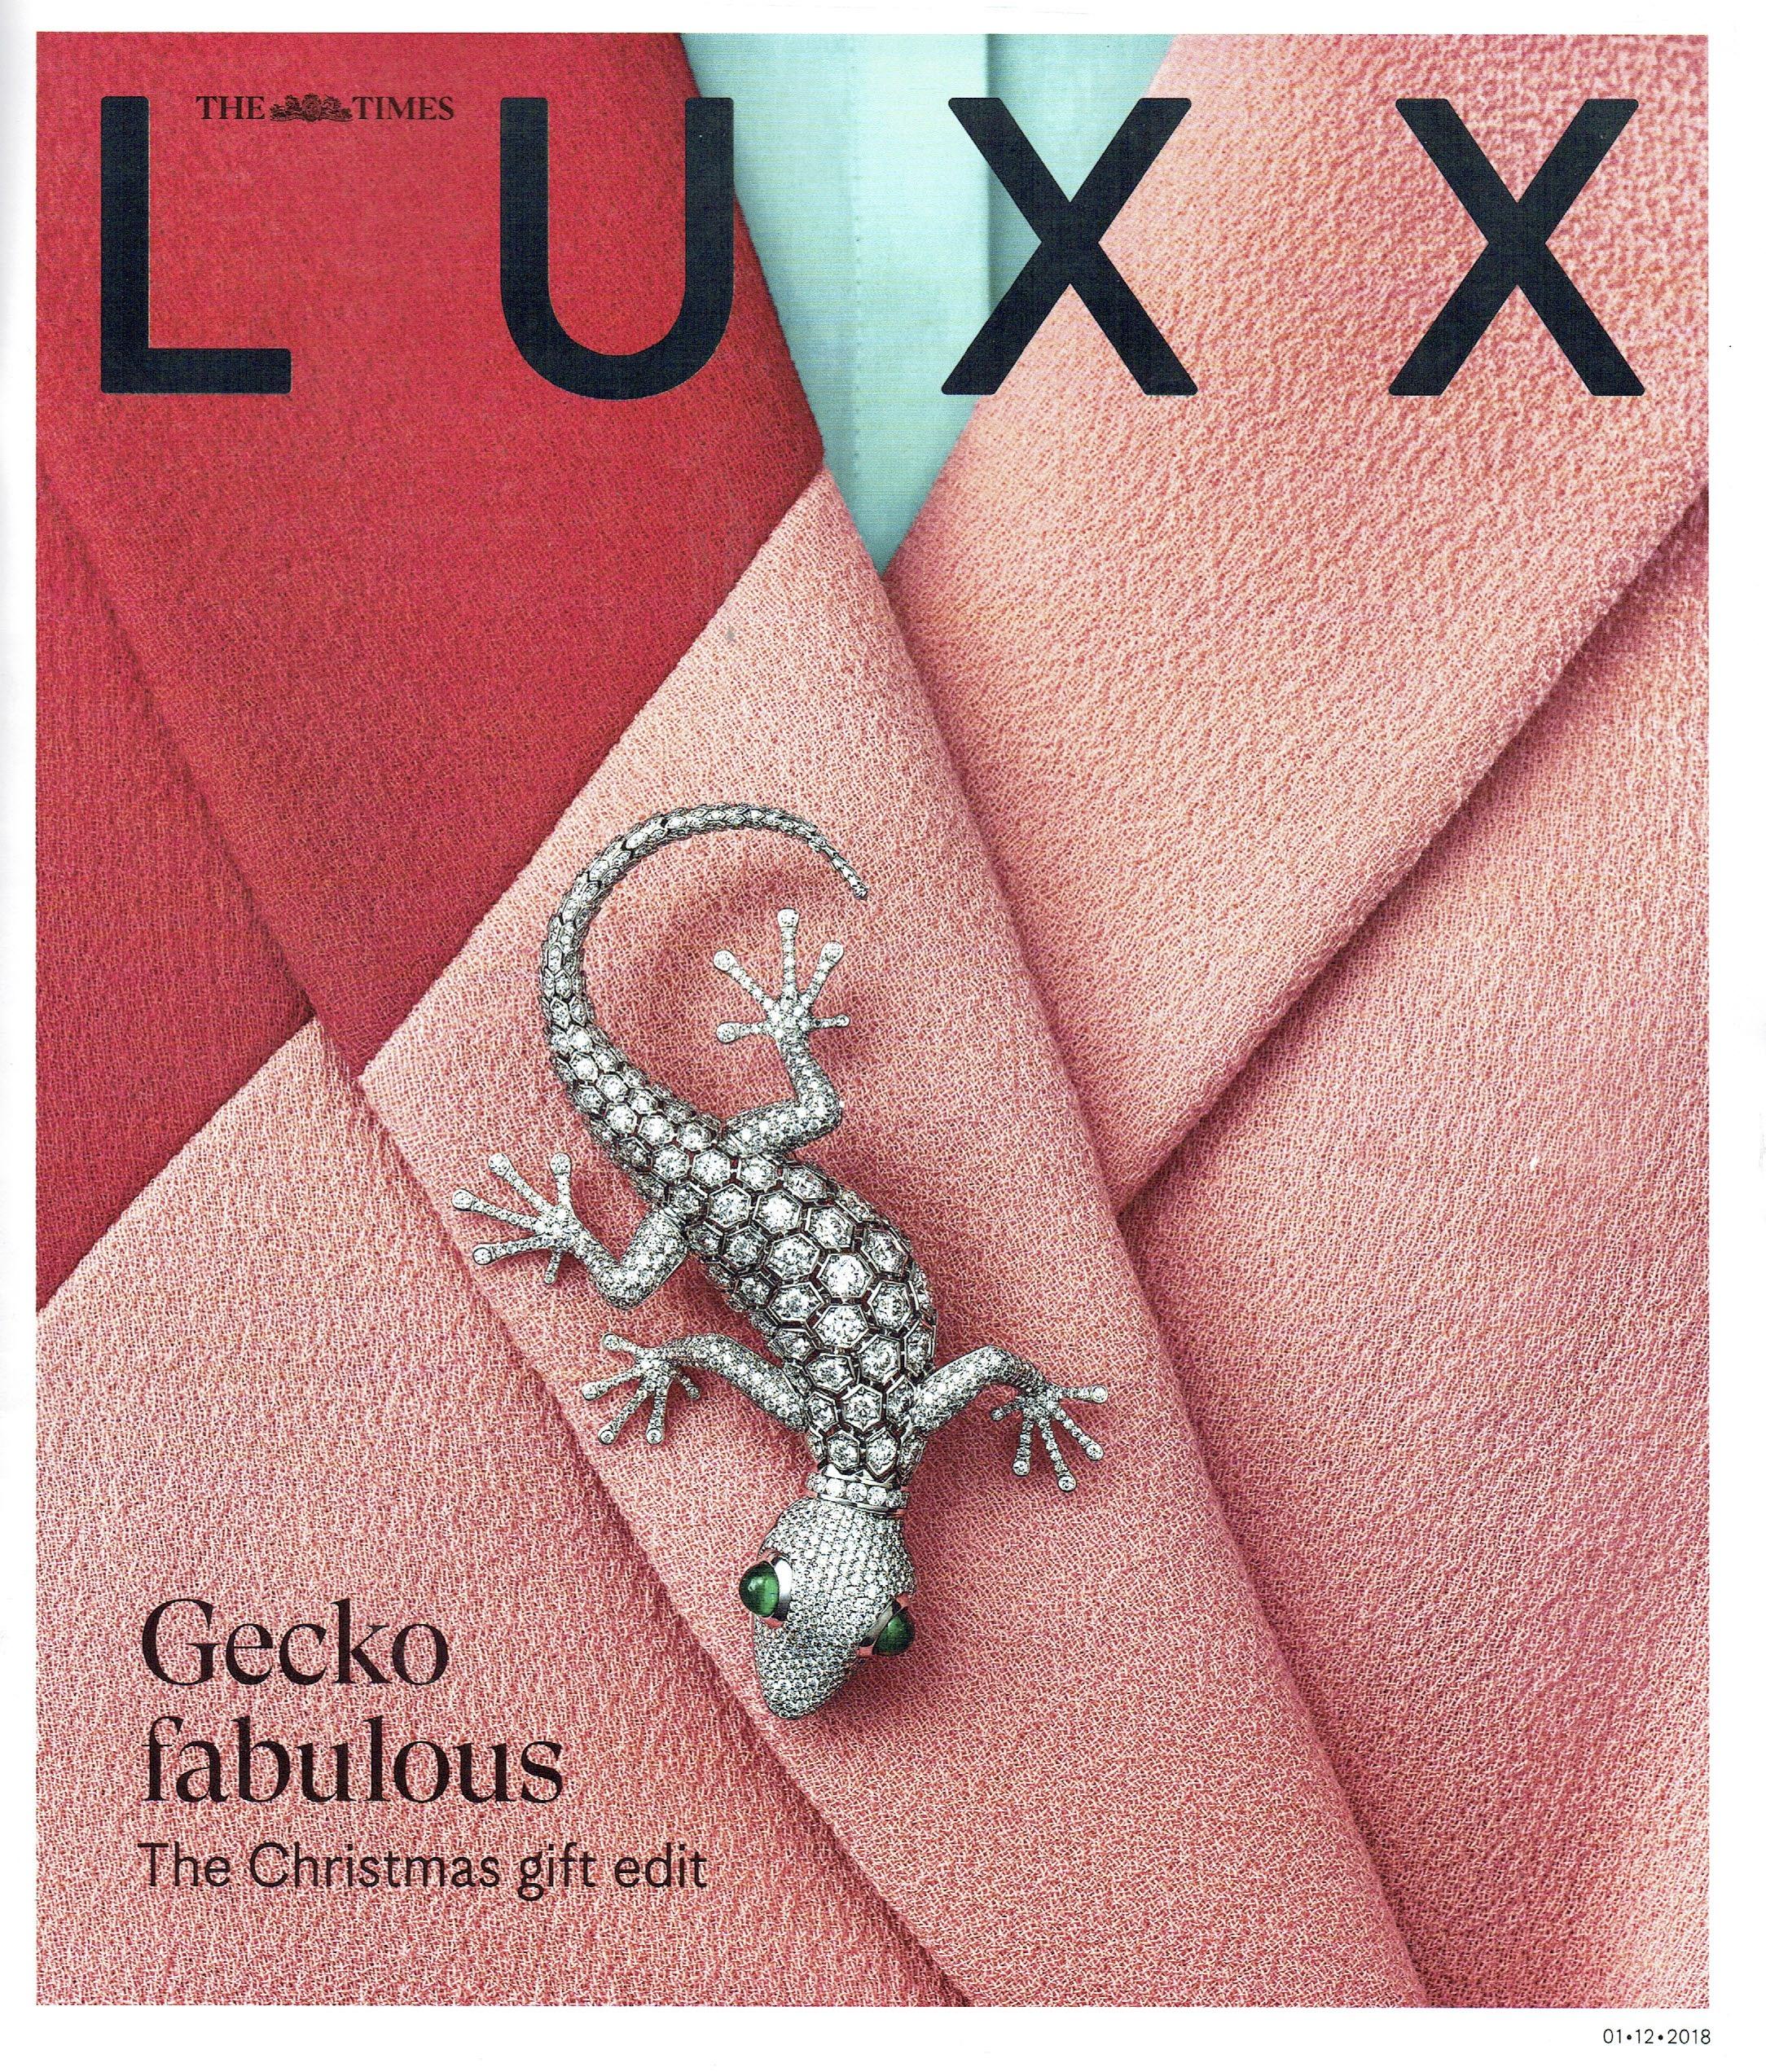 Times LUXX cover - December 2018.jpg